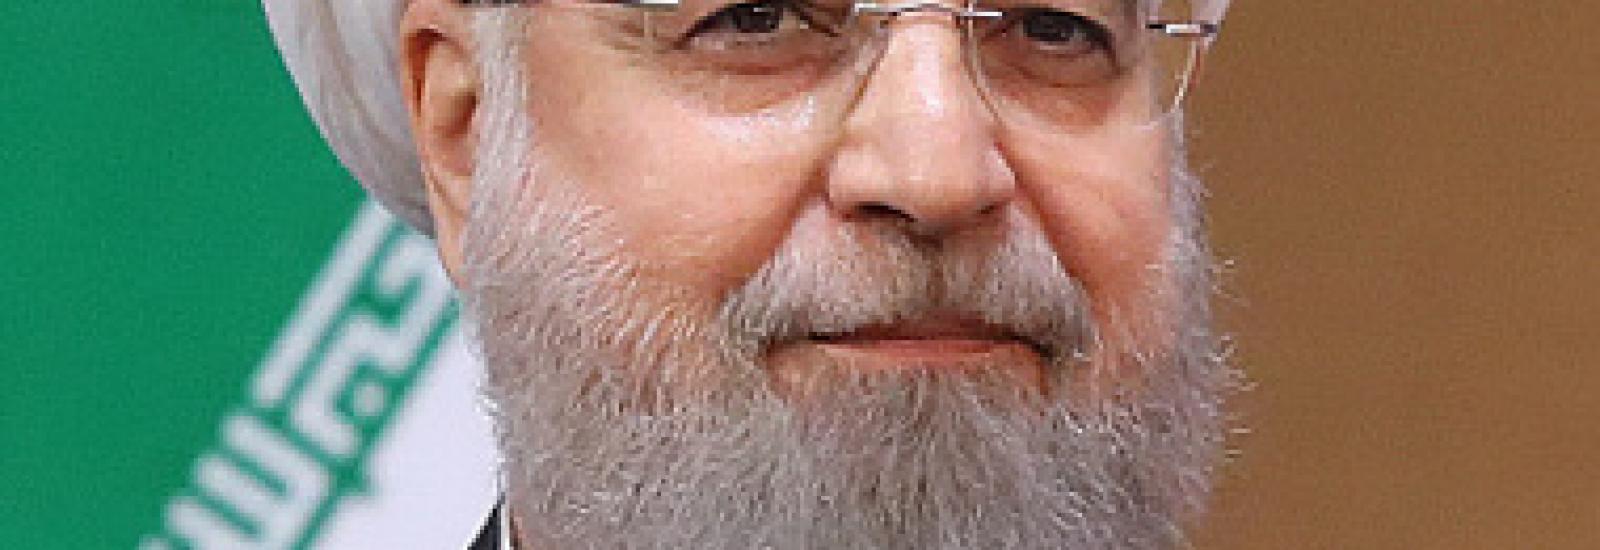 crédit Khamenei.ir, CC BY 4.0.jpg